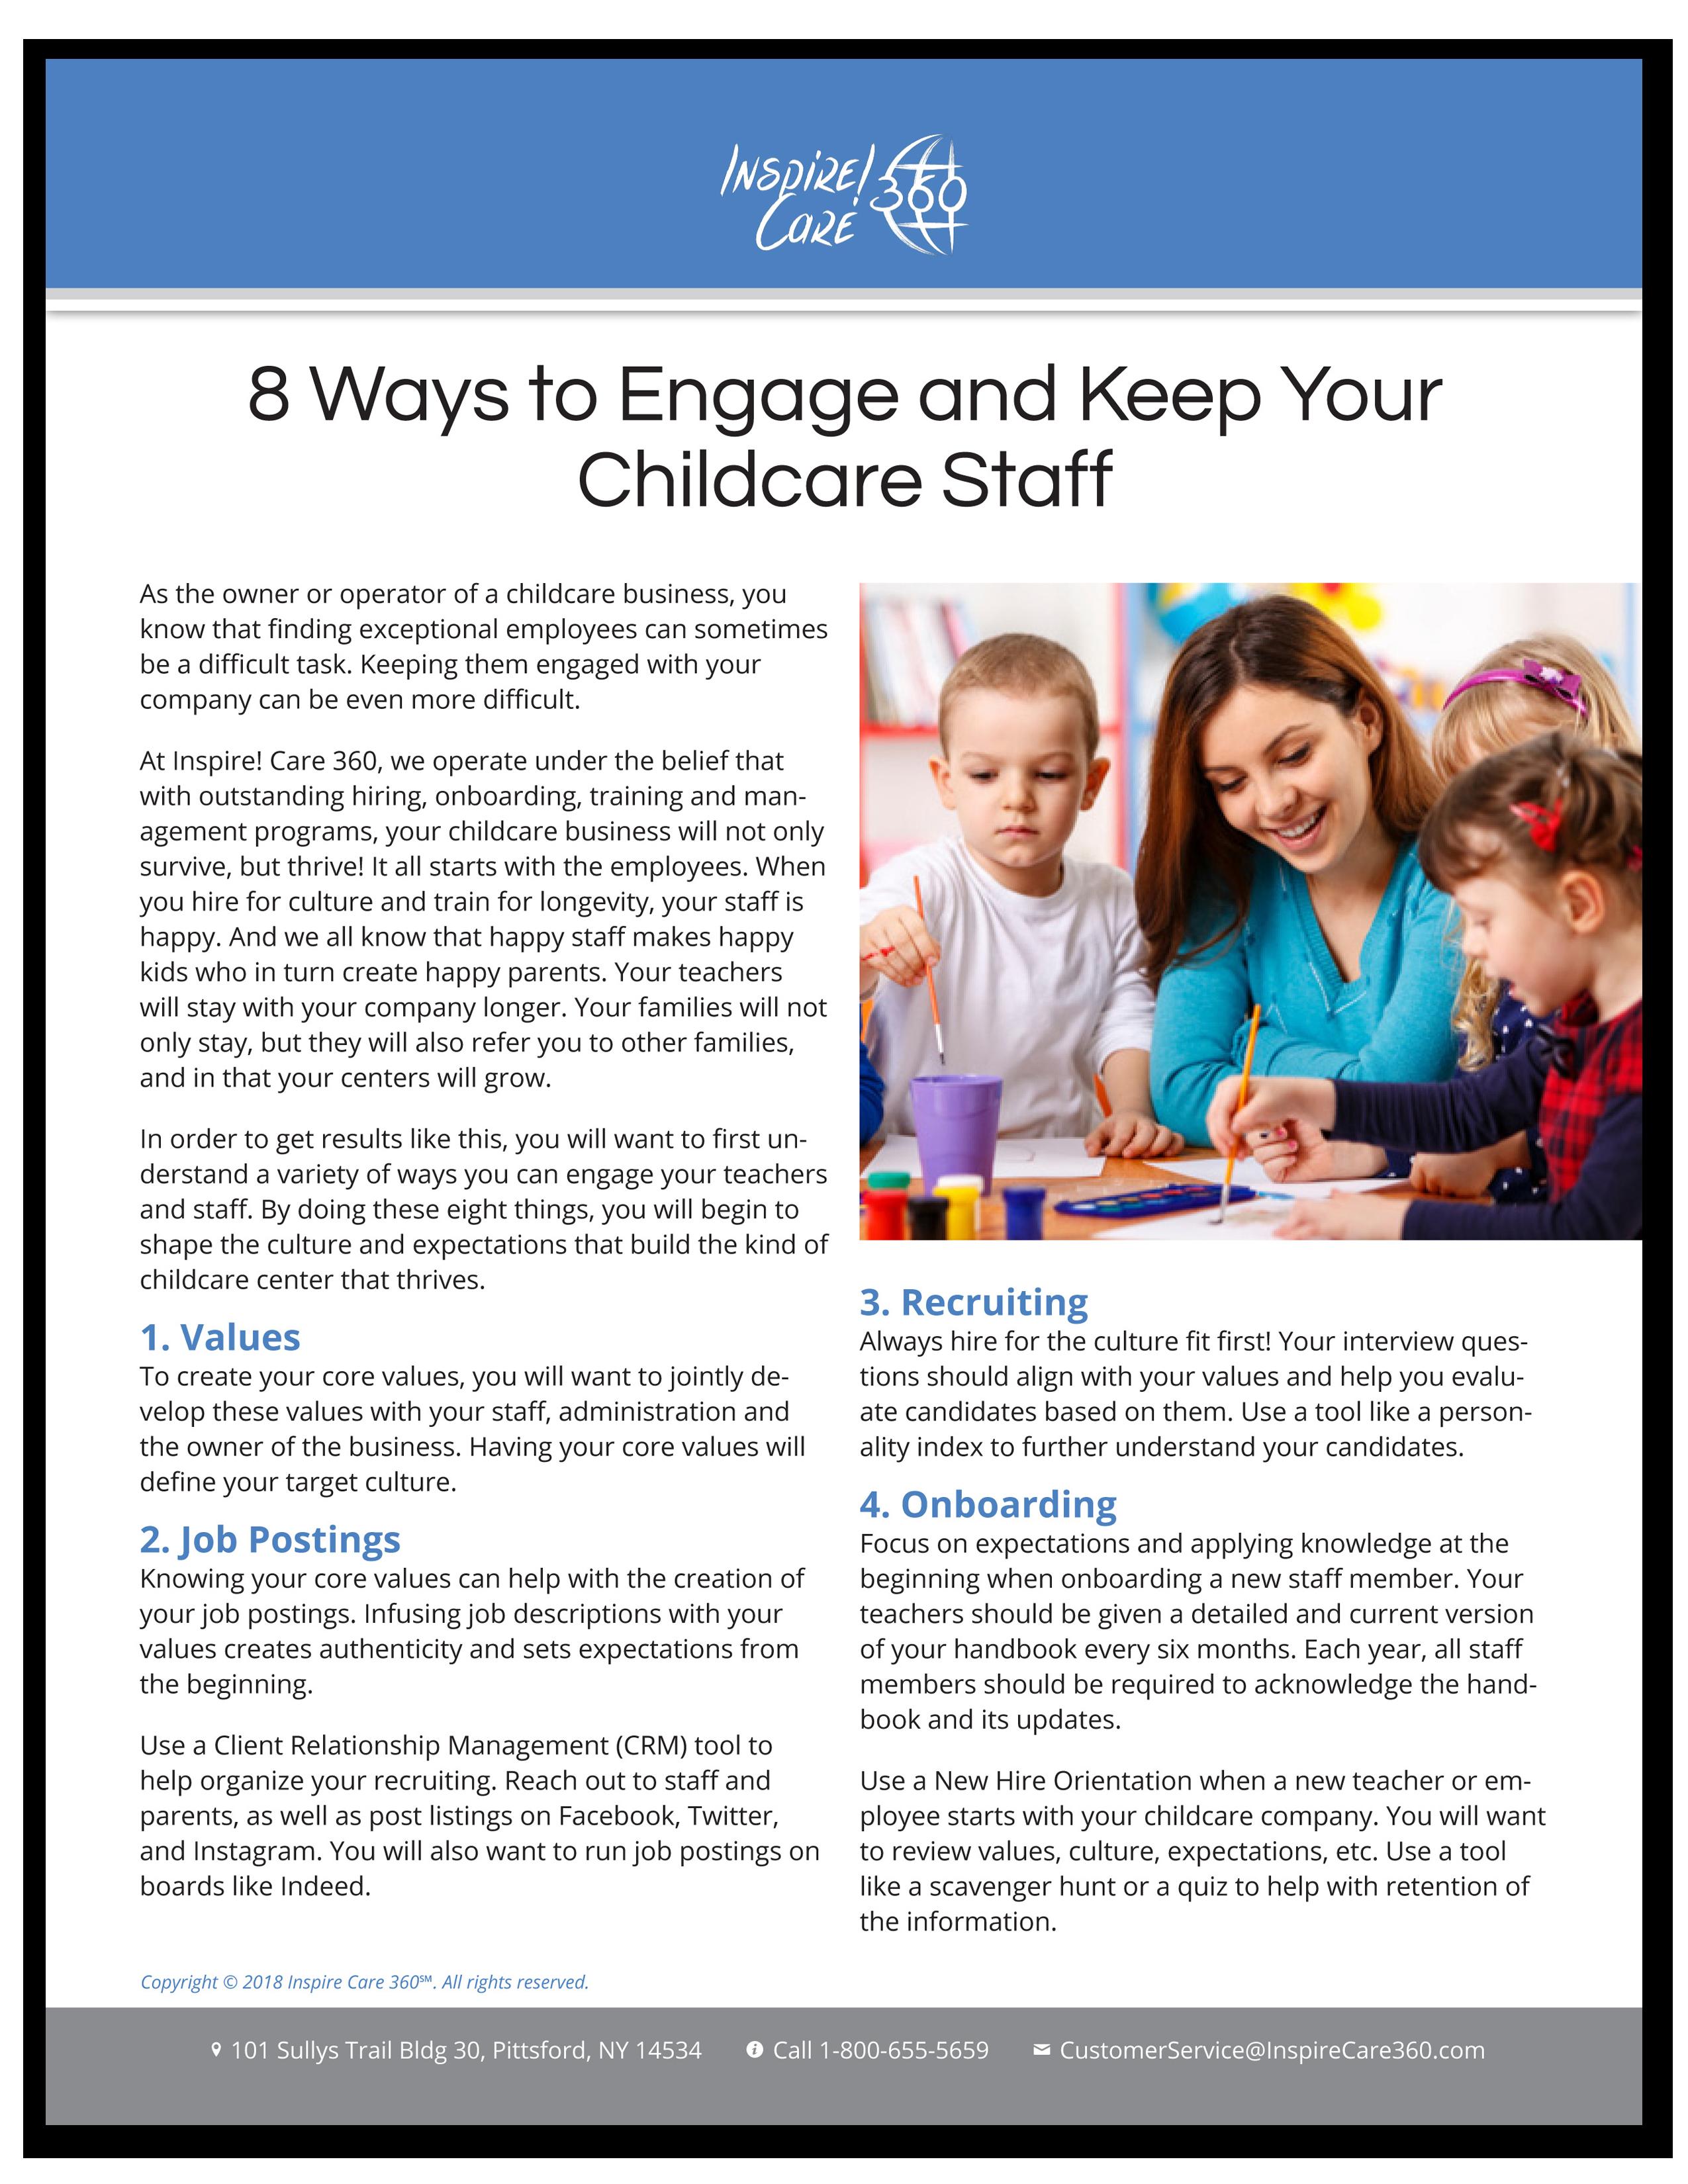 childcare staff engagement